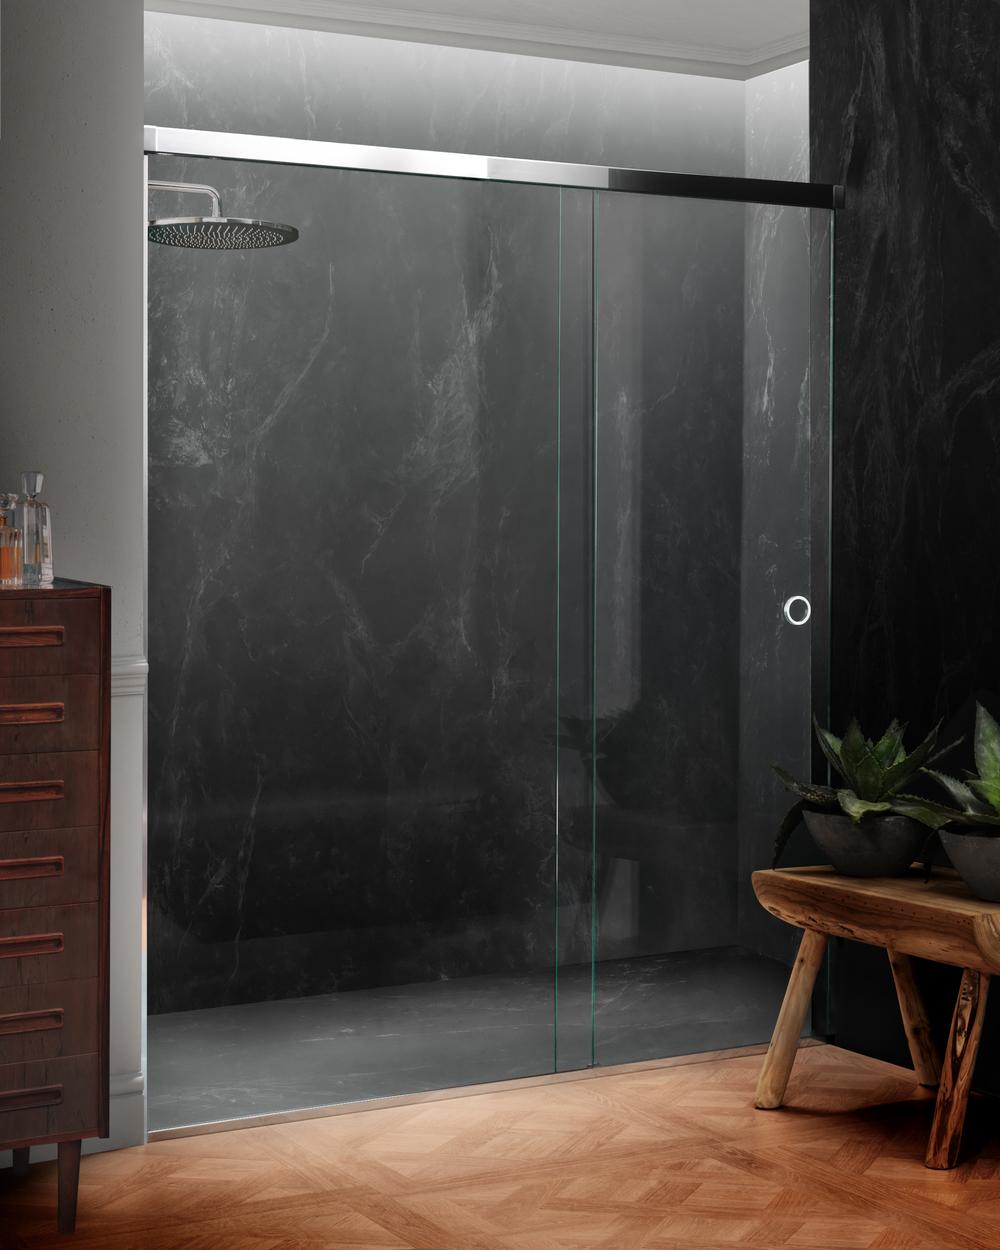 Harmony Alcove Sliding Door revised web.jpg